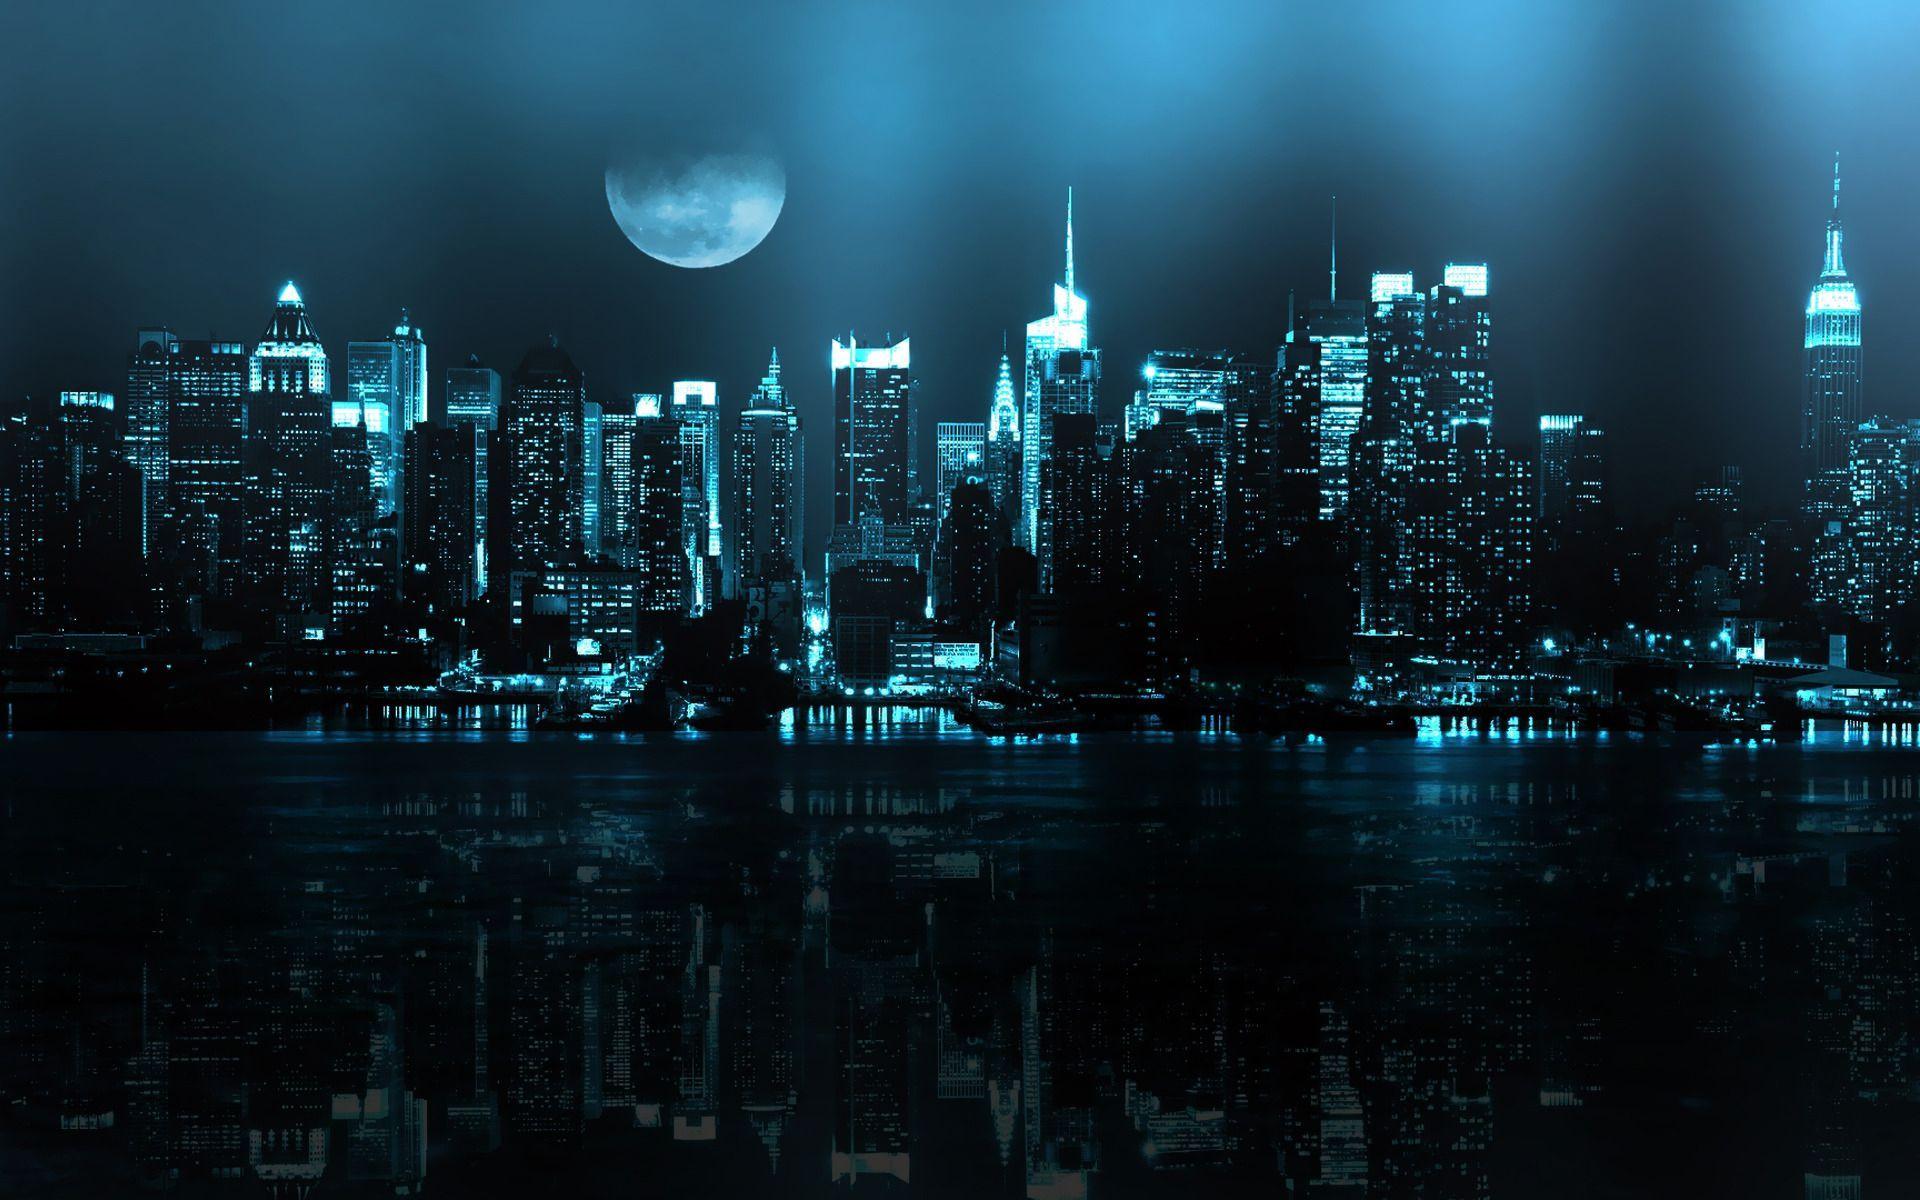 Dark Newyork City Wallpaper Hd Wallpapers 1080p Download In 2020 Cityscape Wallpaper Cool Desktop Backgrounds City Wallpaper